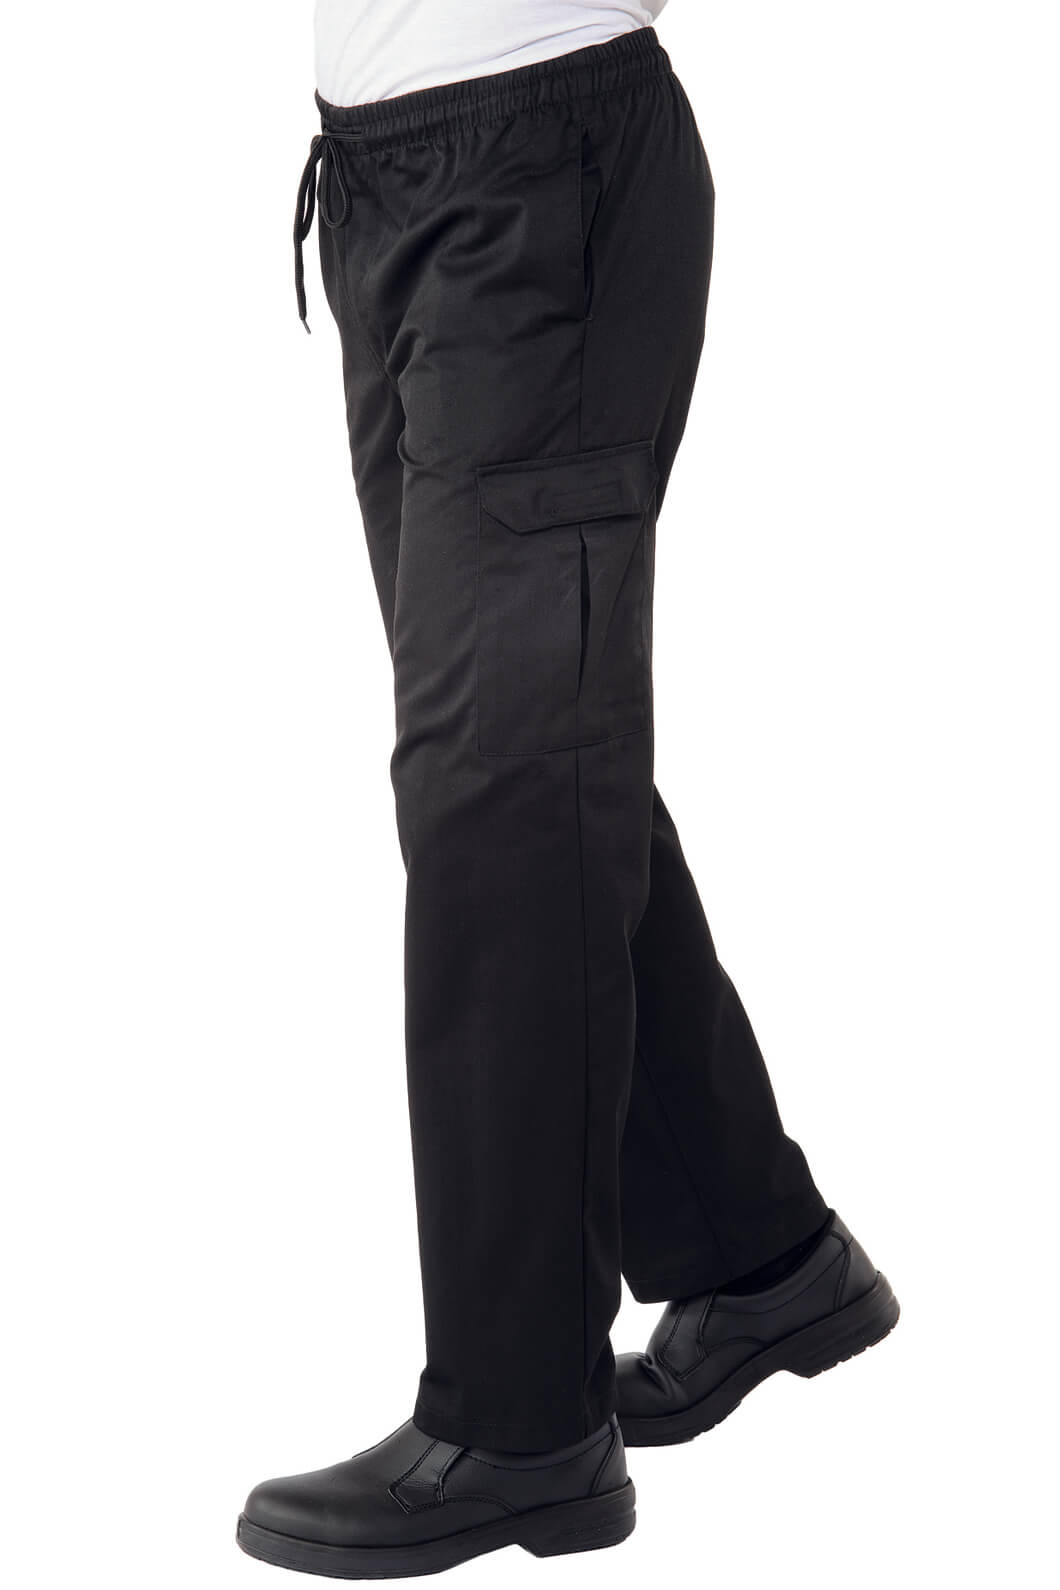 Pantalon chef cuisinier noir pantalons de cuisine for Cuisinier 71